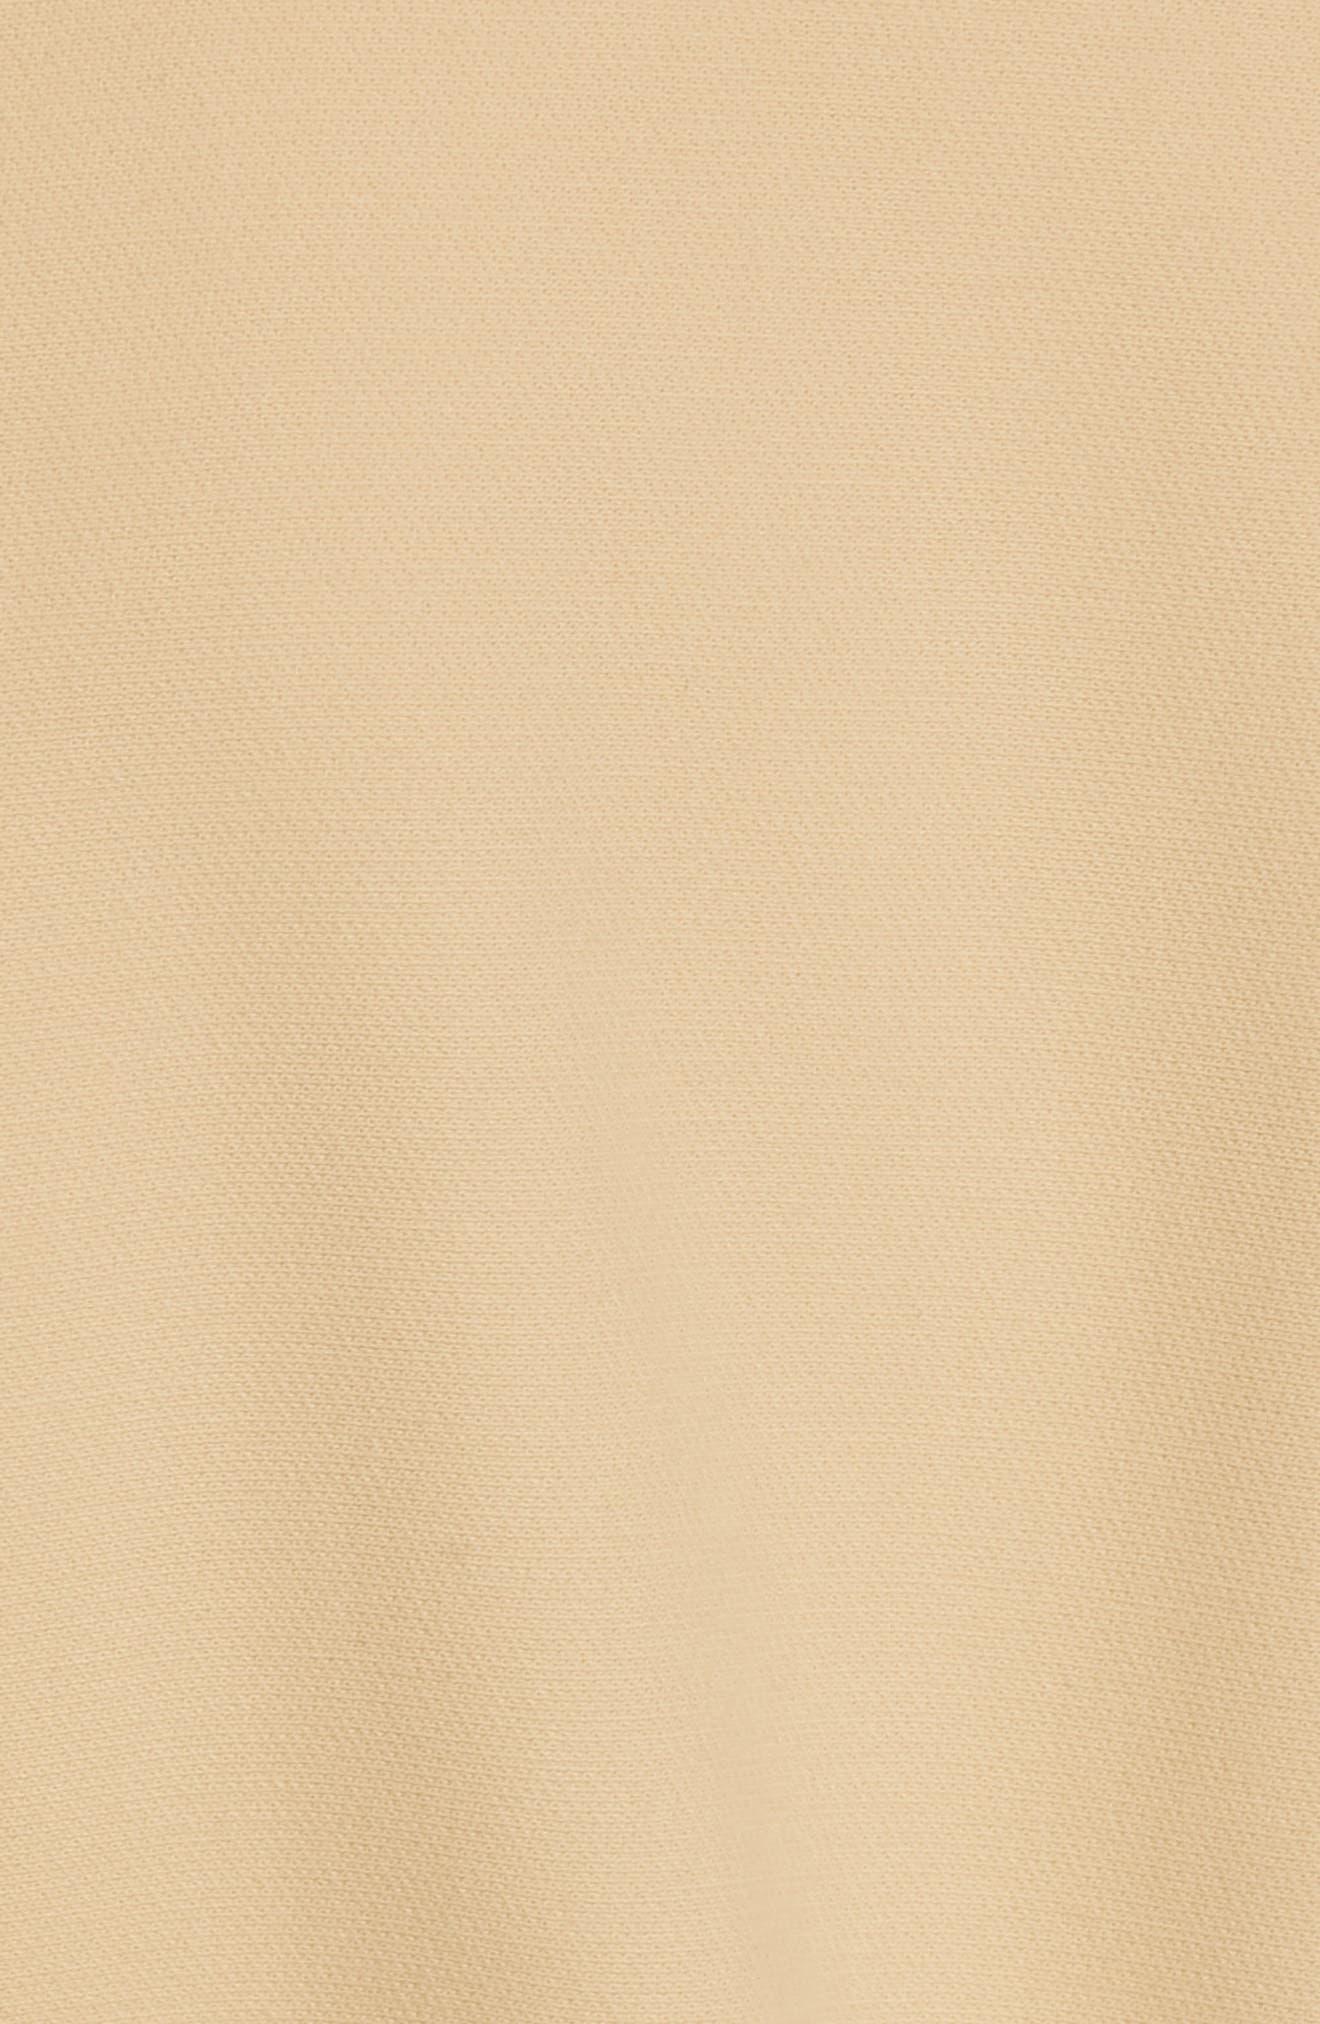 Alyssandra Trench Coat,                             Alternate thumbnail 6, color,                             BISCUIT